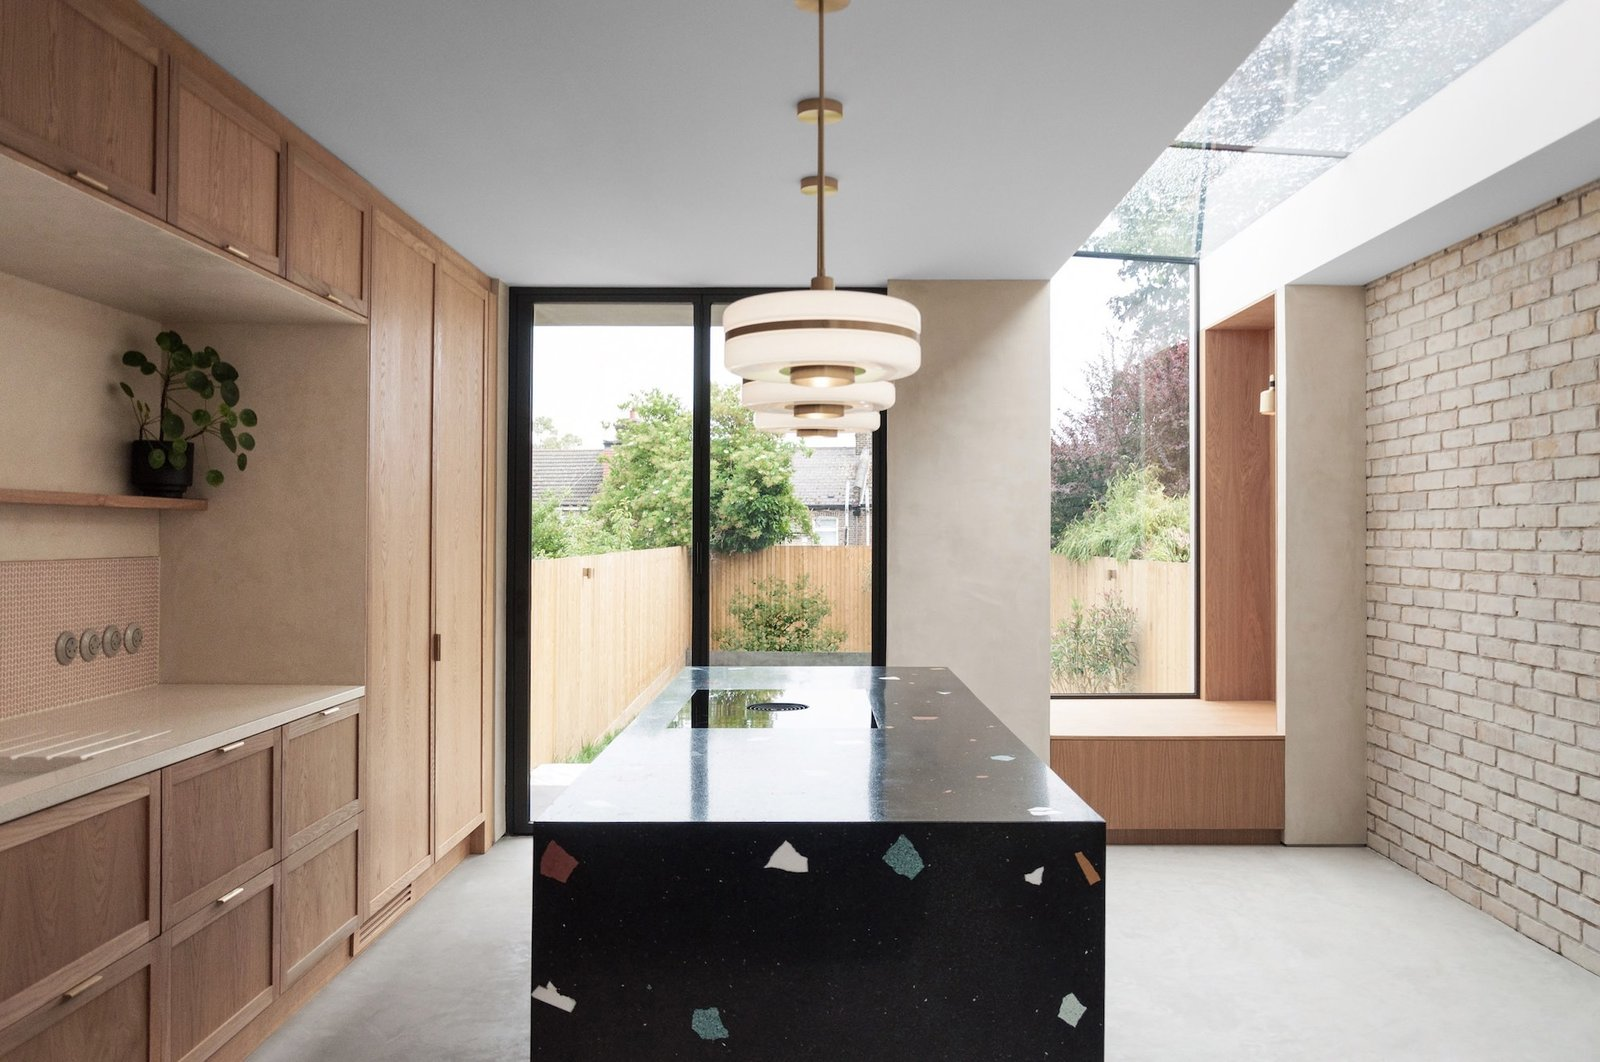 Glyn House by Yellow Cloud Studio kitchen with black terrazzo island